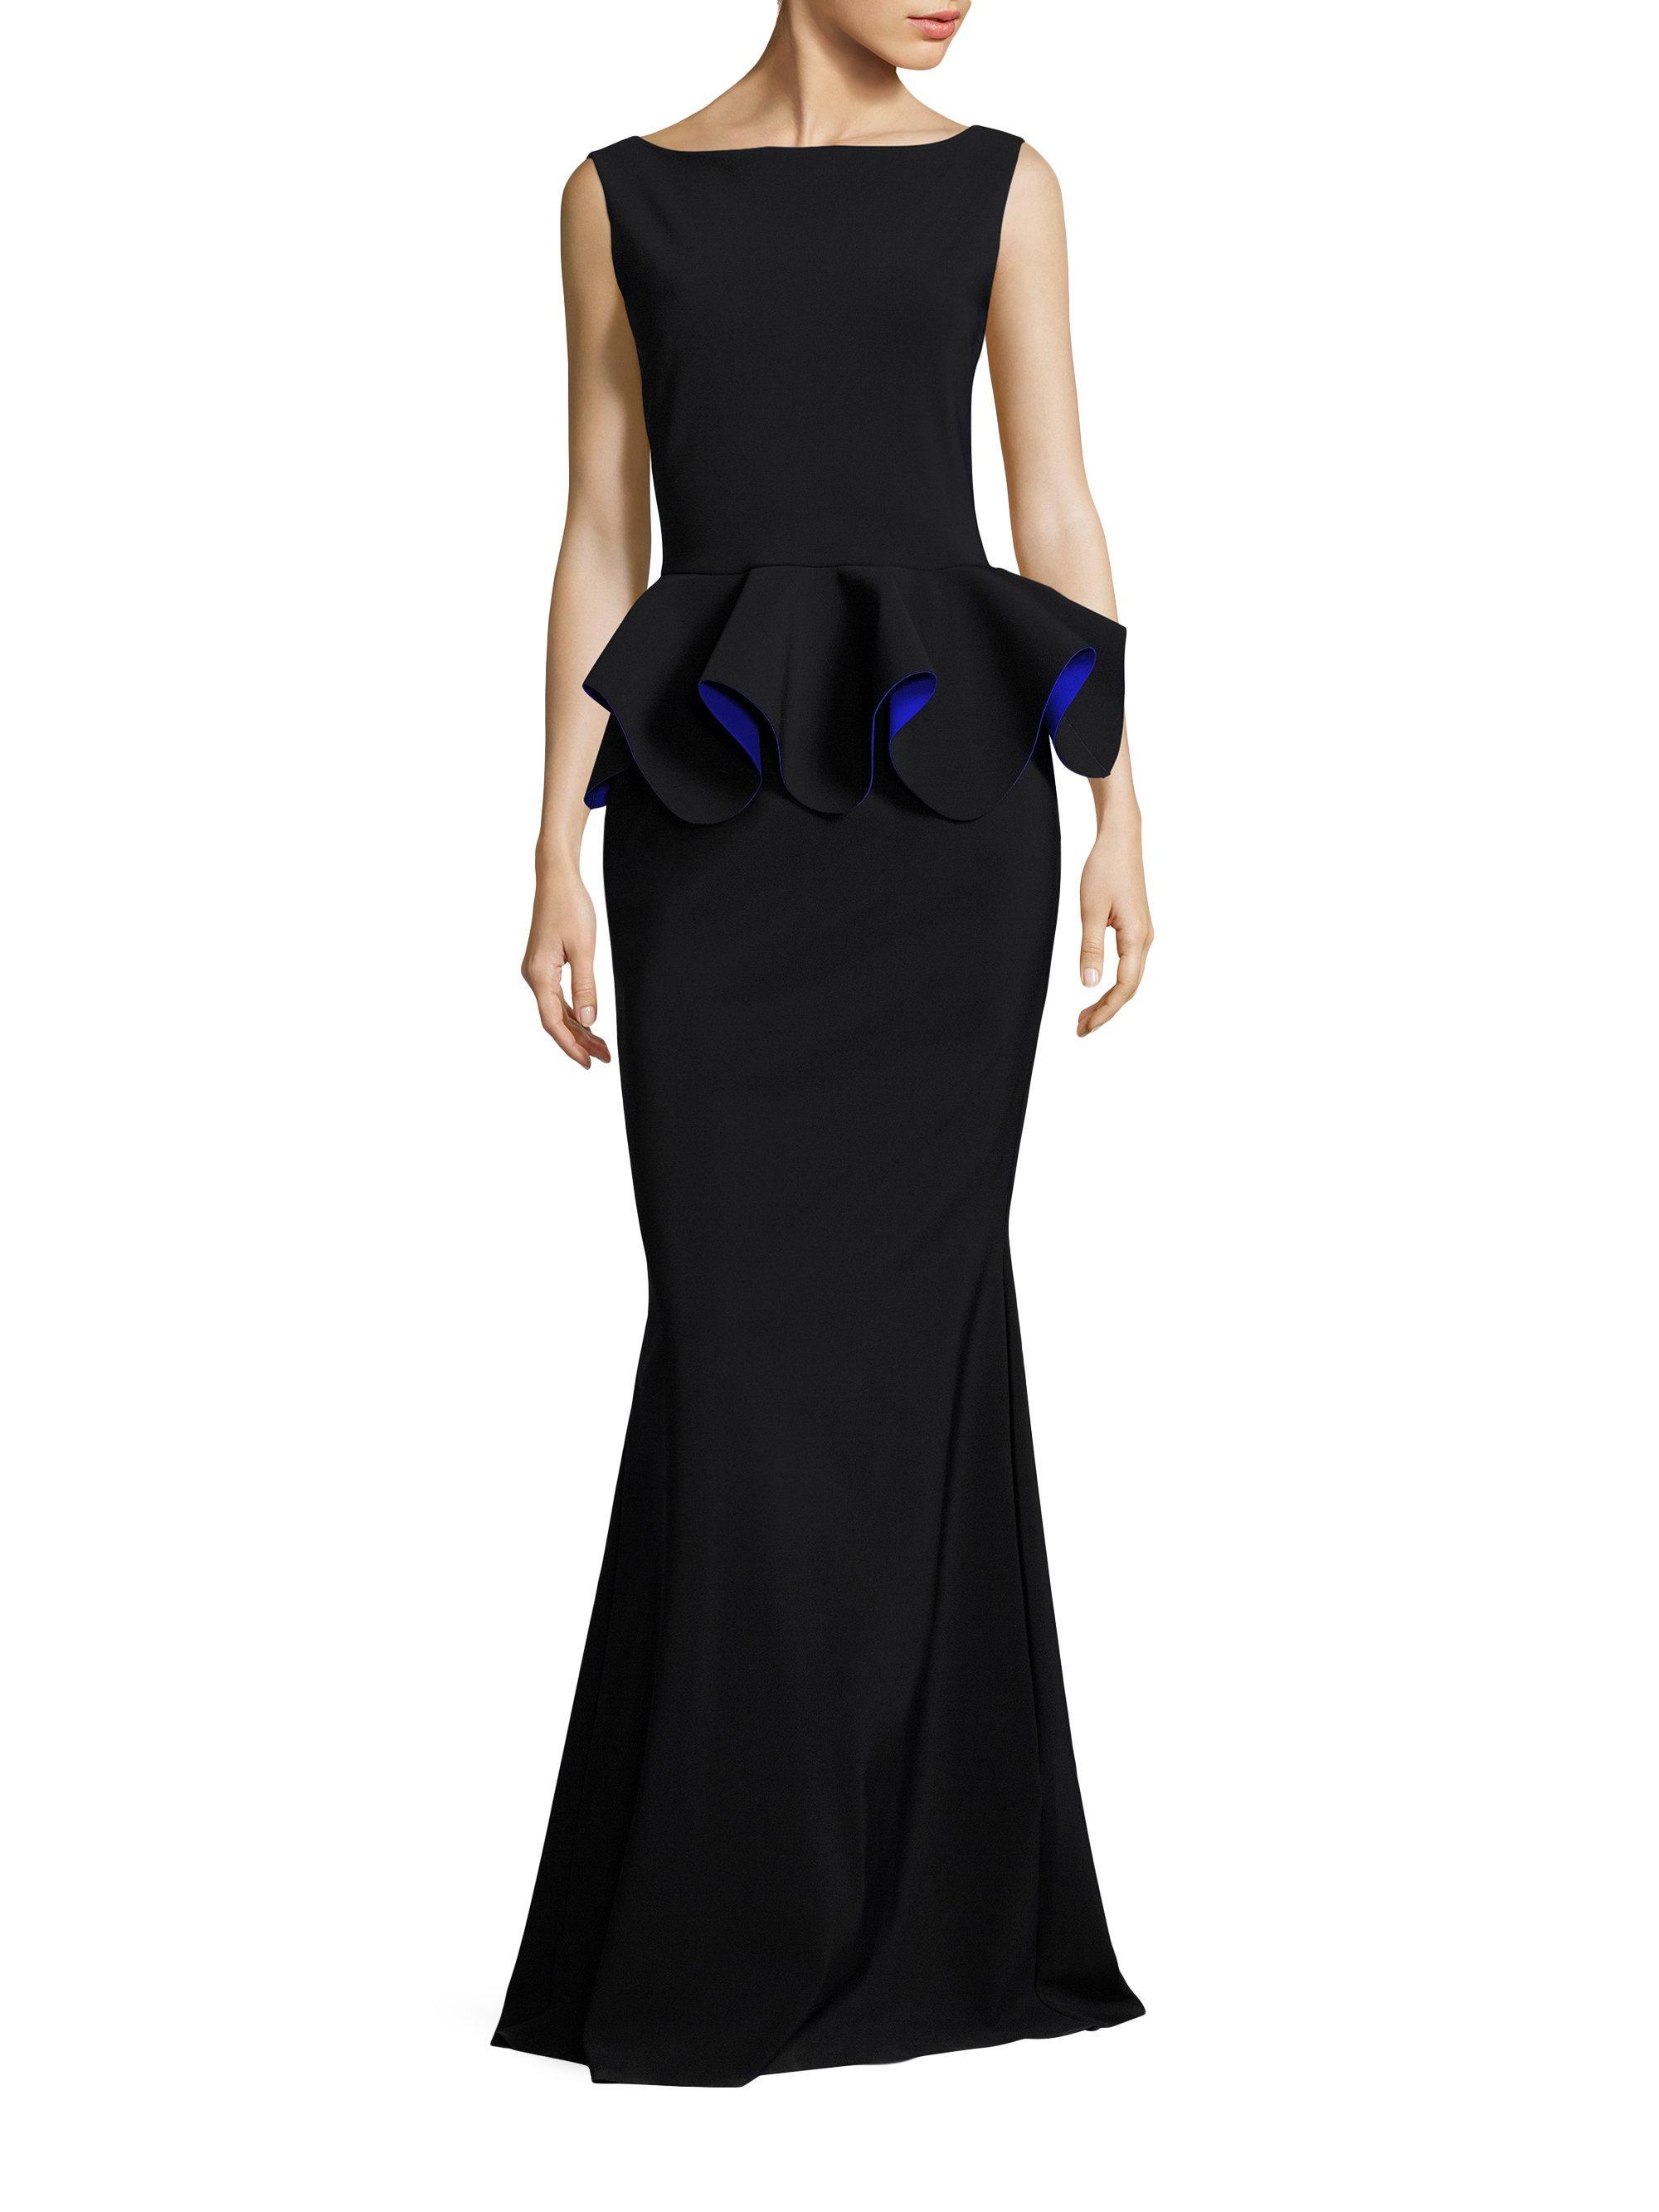 lyst la petite robe di chiara boni eden peplum gown in black. Black Bedroom Furniture Sets. Home Design Ideas